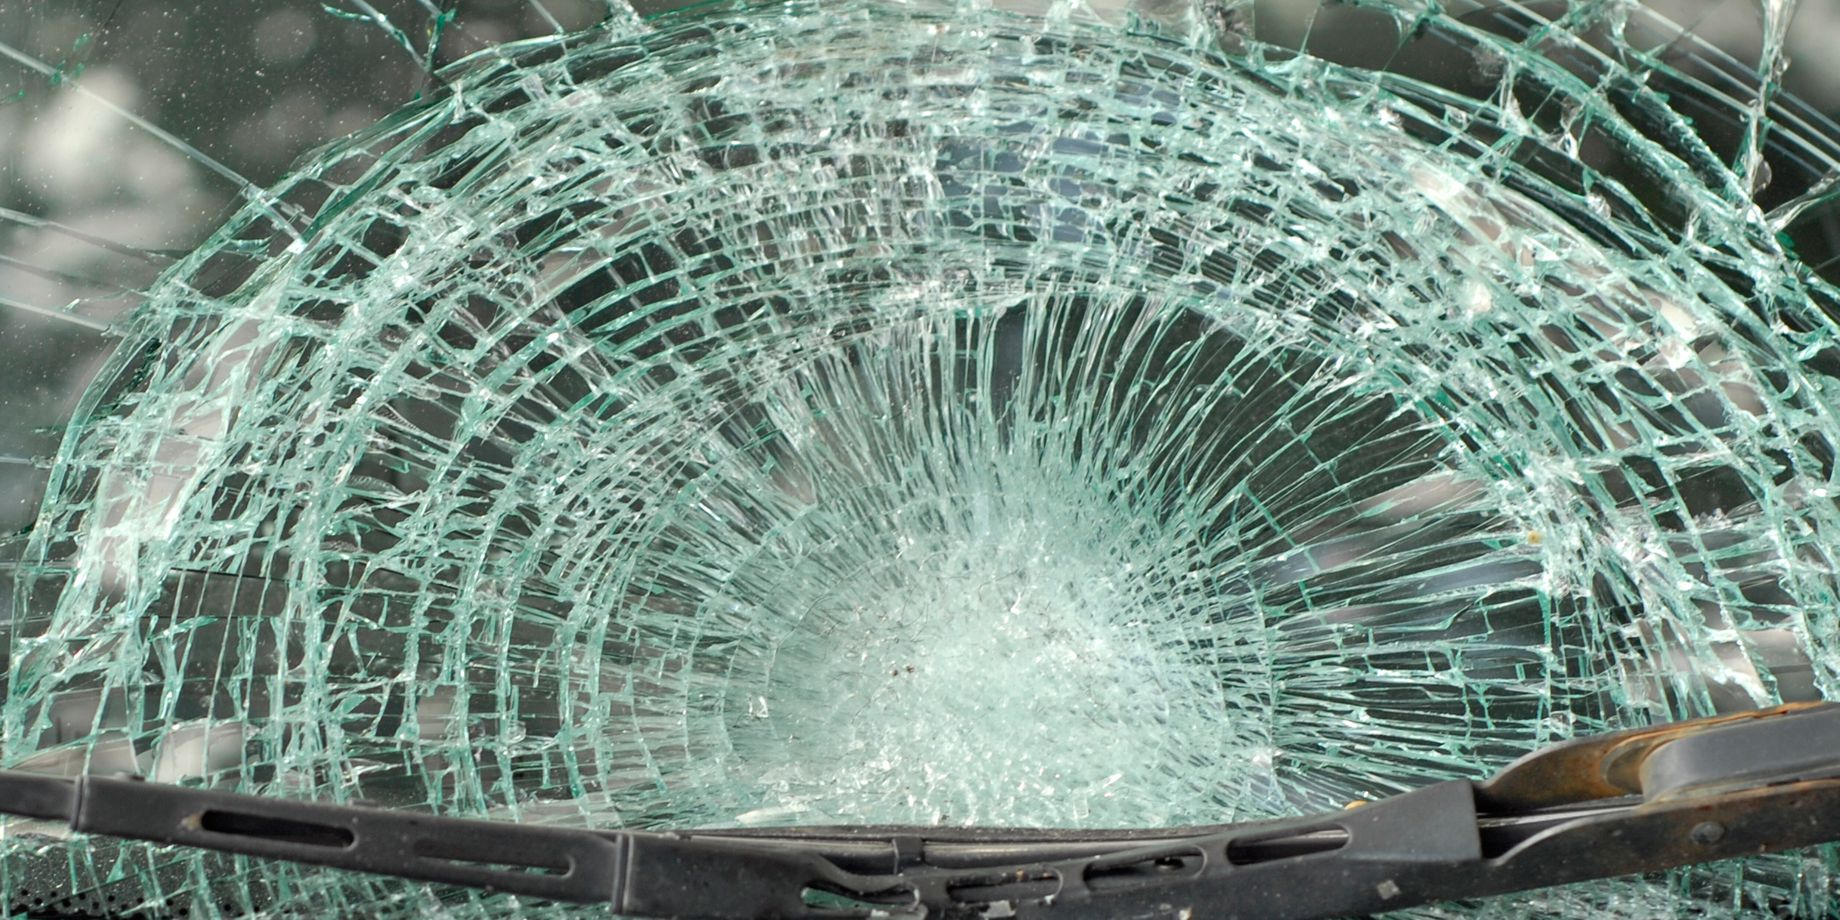 Richmond man killed in single-vehicle crash